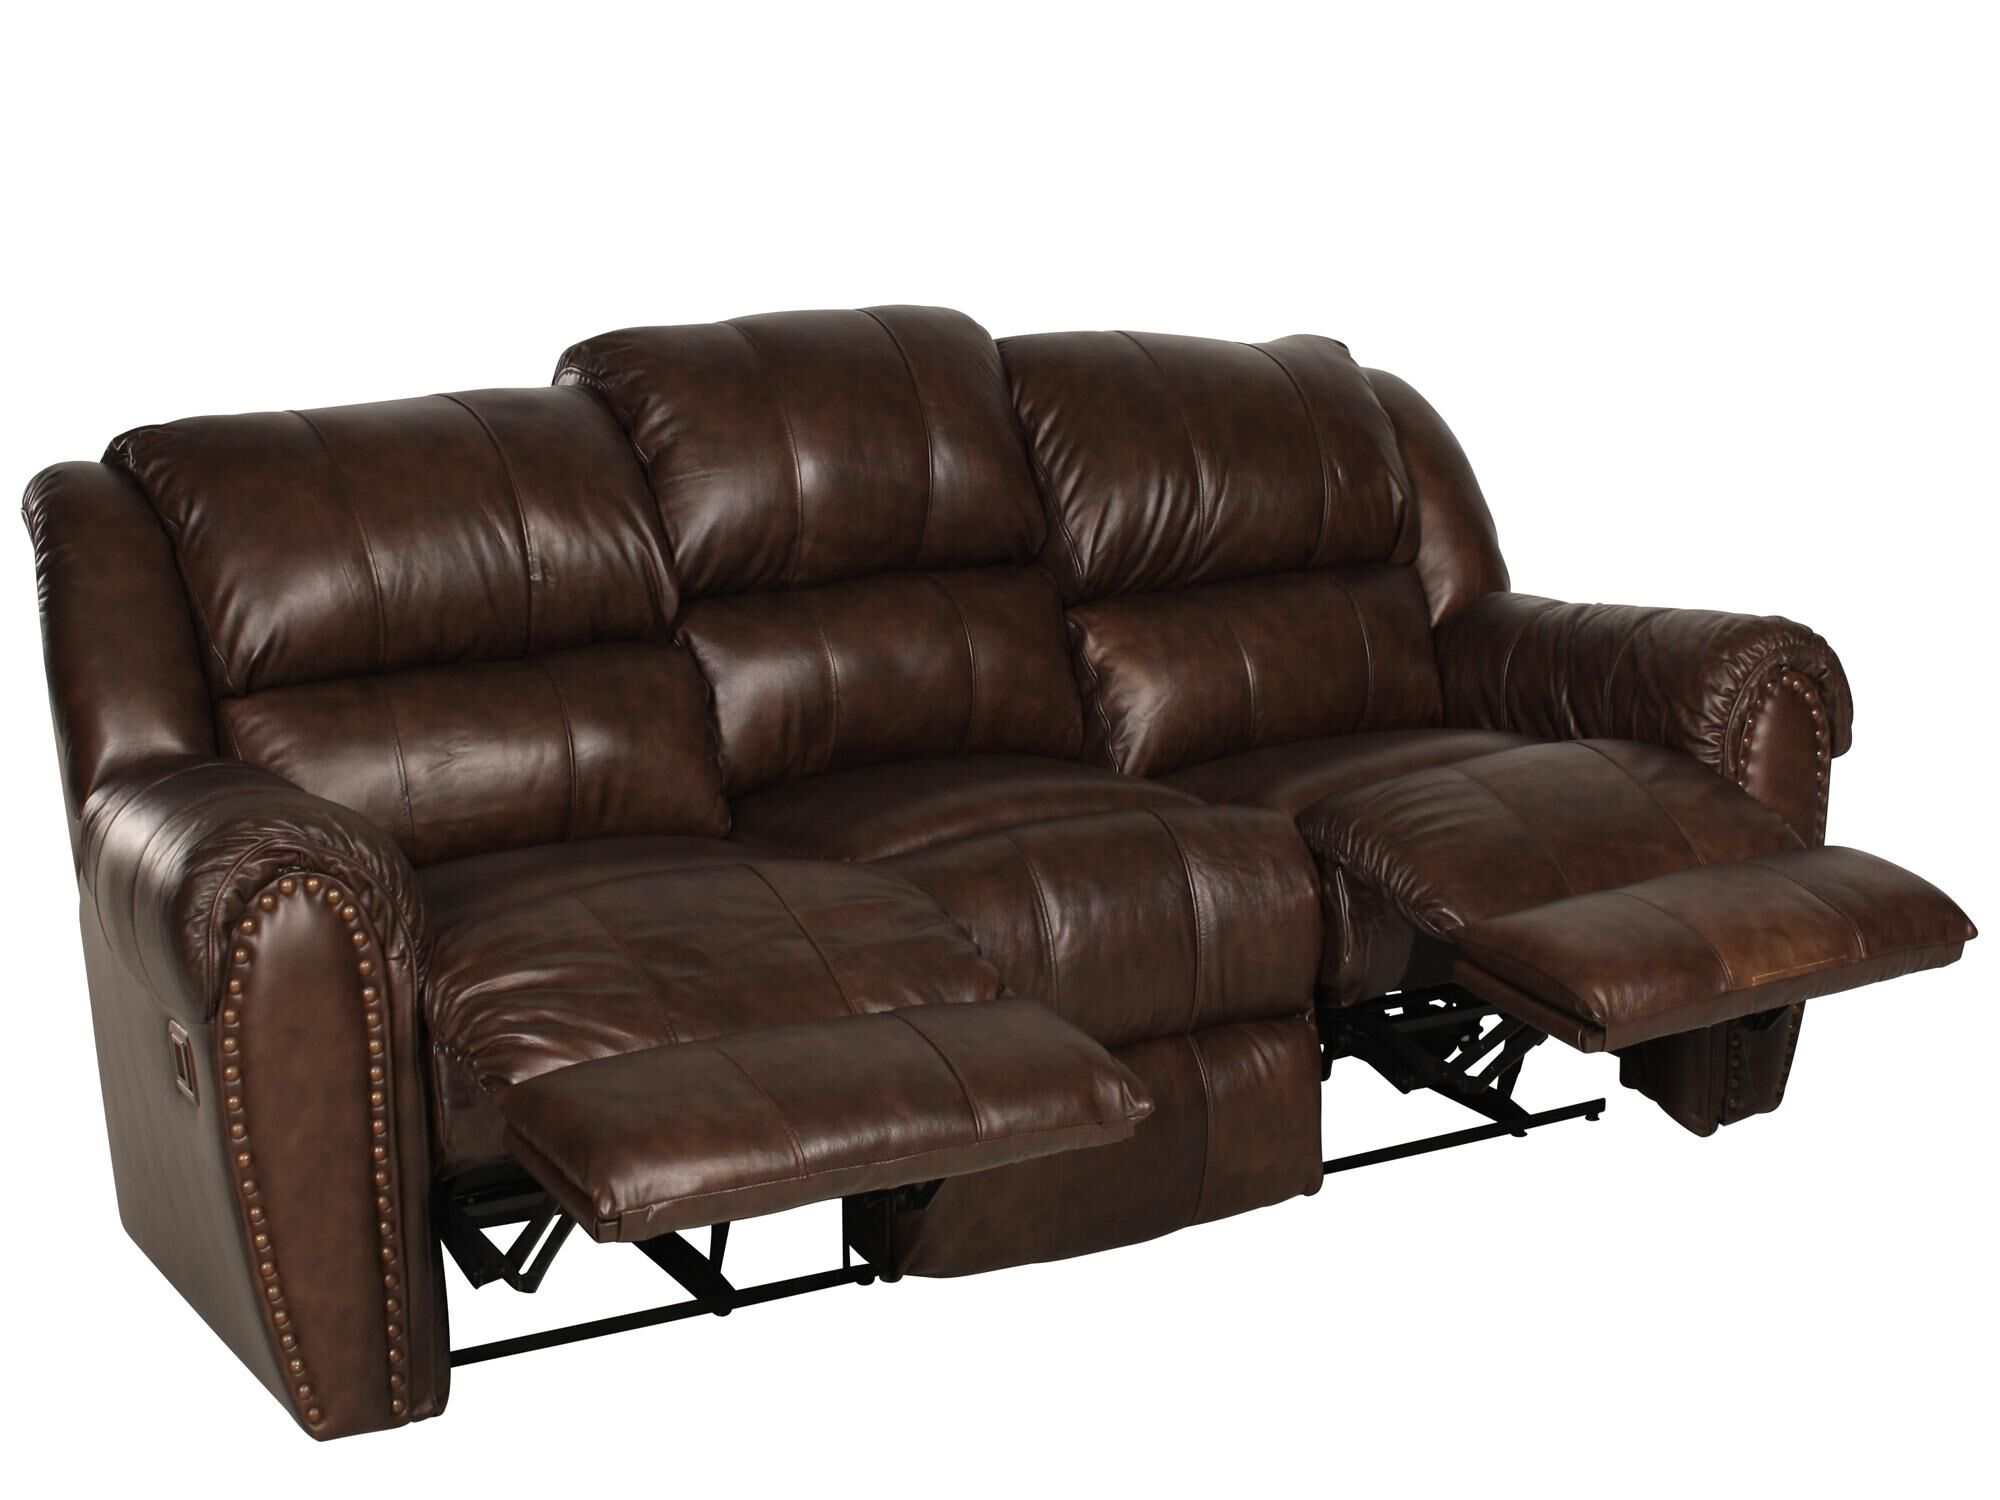 Traditional Nailhead Accented 89 Reclining Sofa